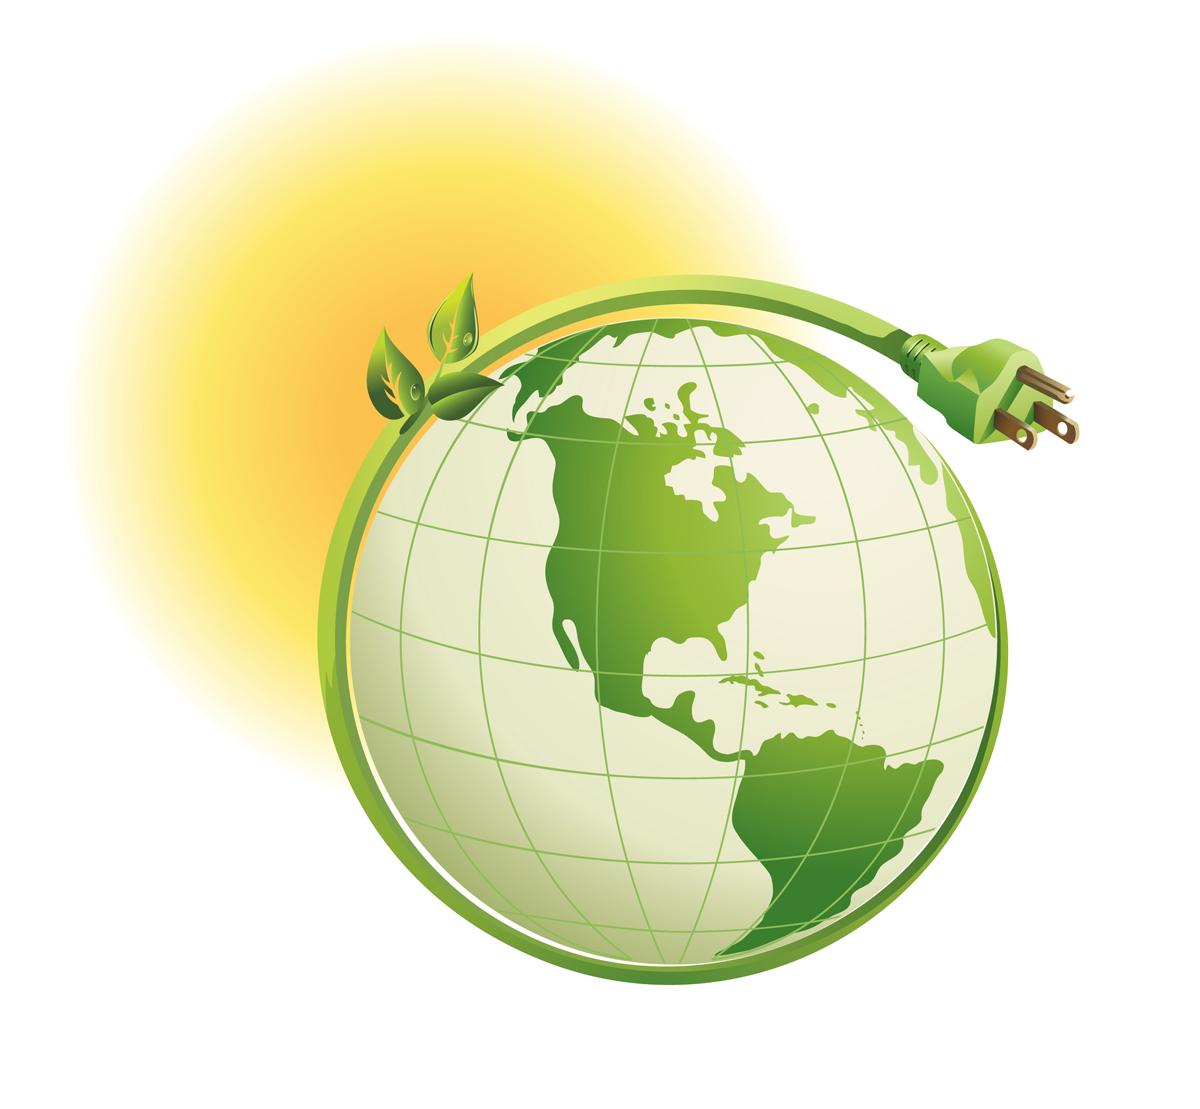 mengapa sumber energi terbarukan perlu disubsidi